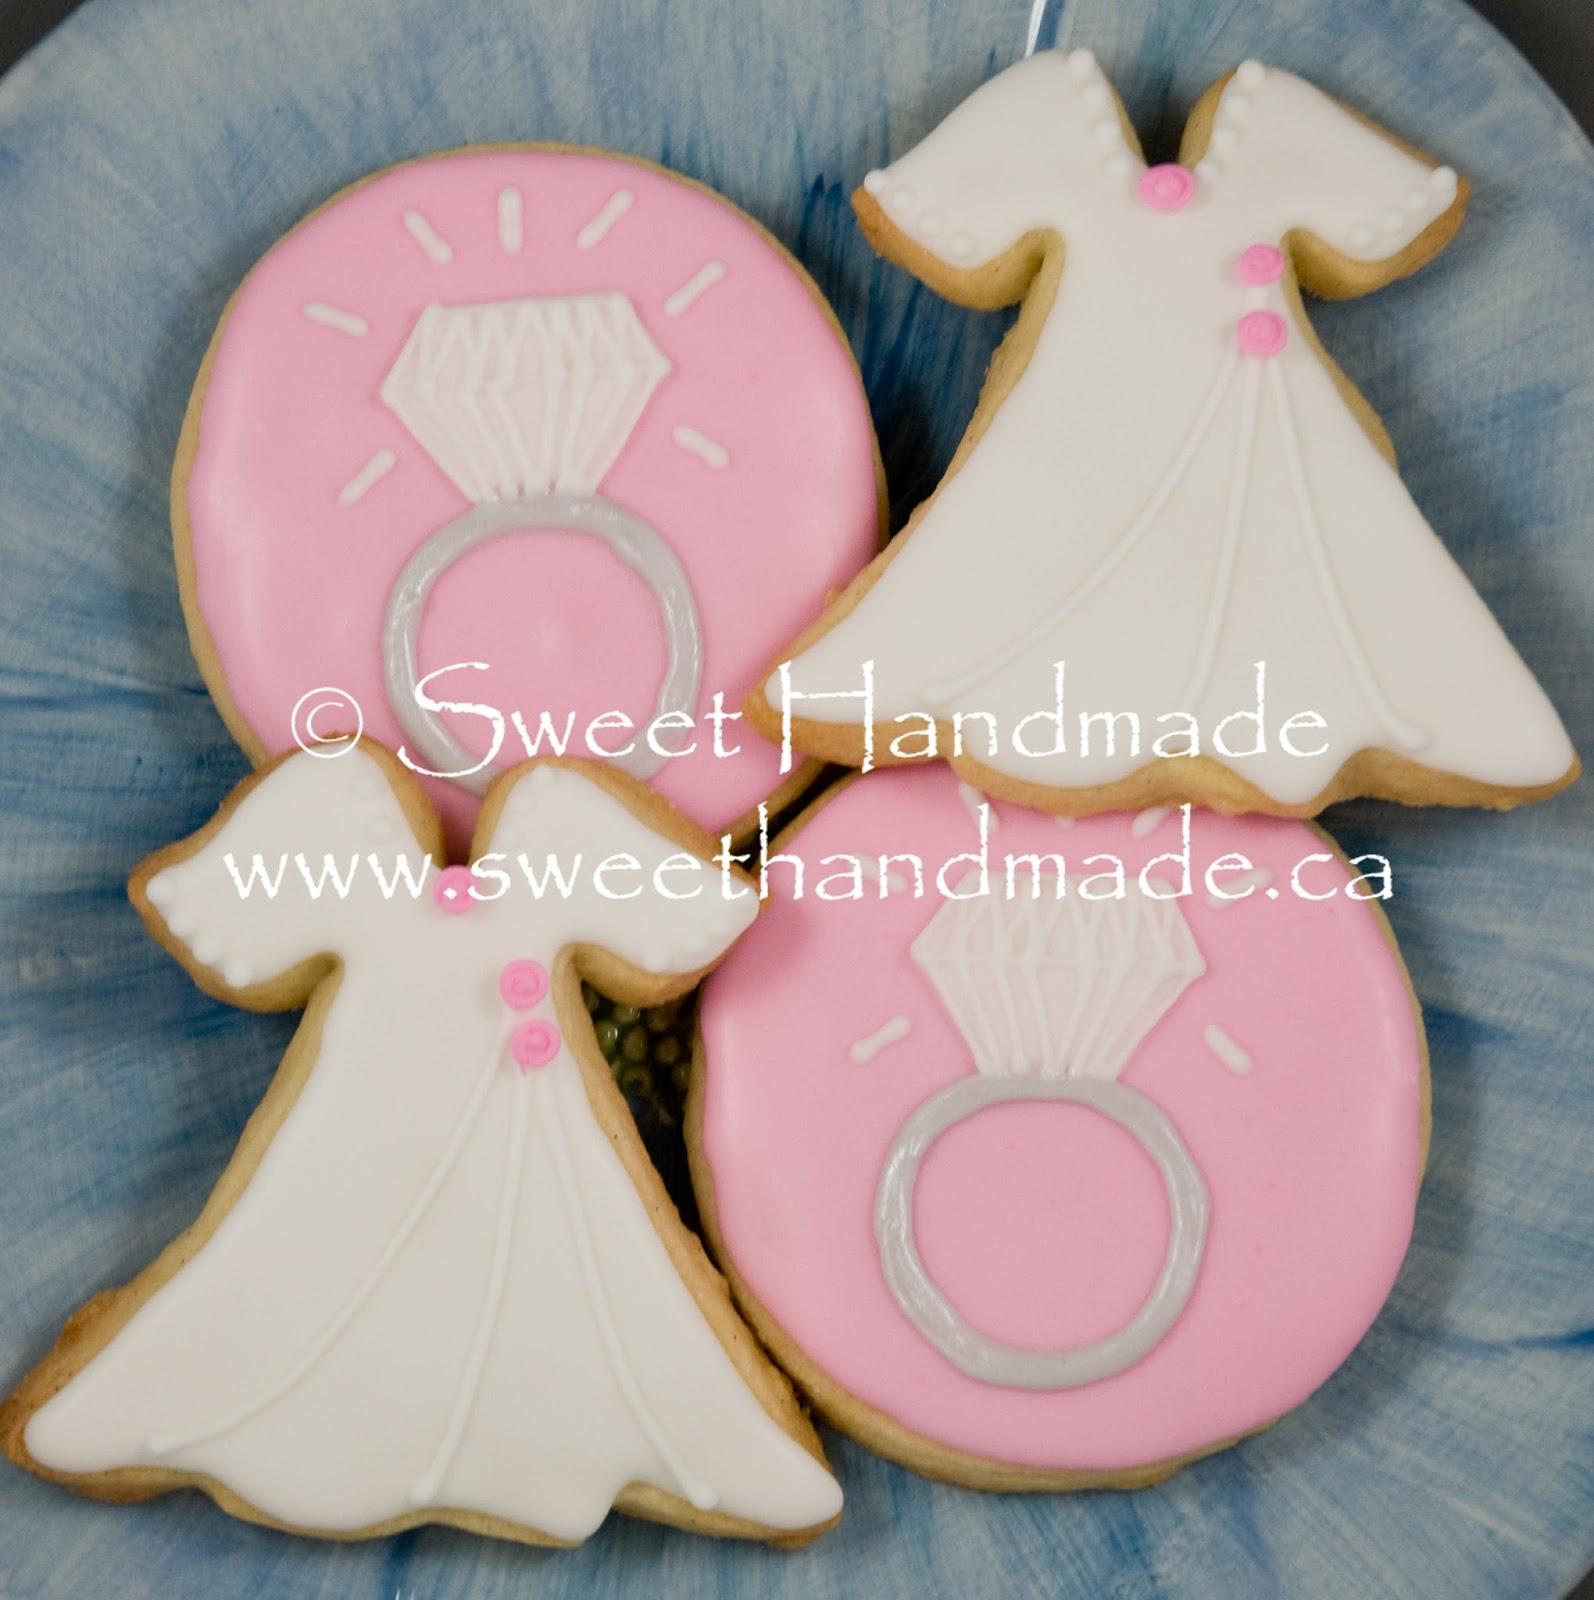 Sweet Handmade Cookies: Diamond Ring and Dress Bridal Shower Cookies